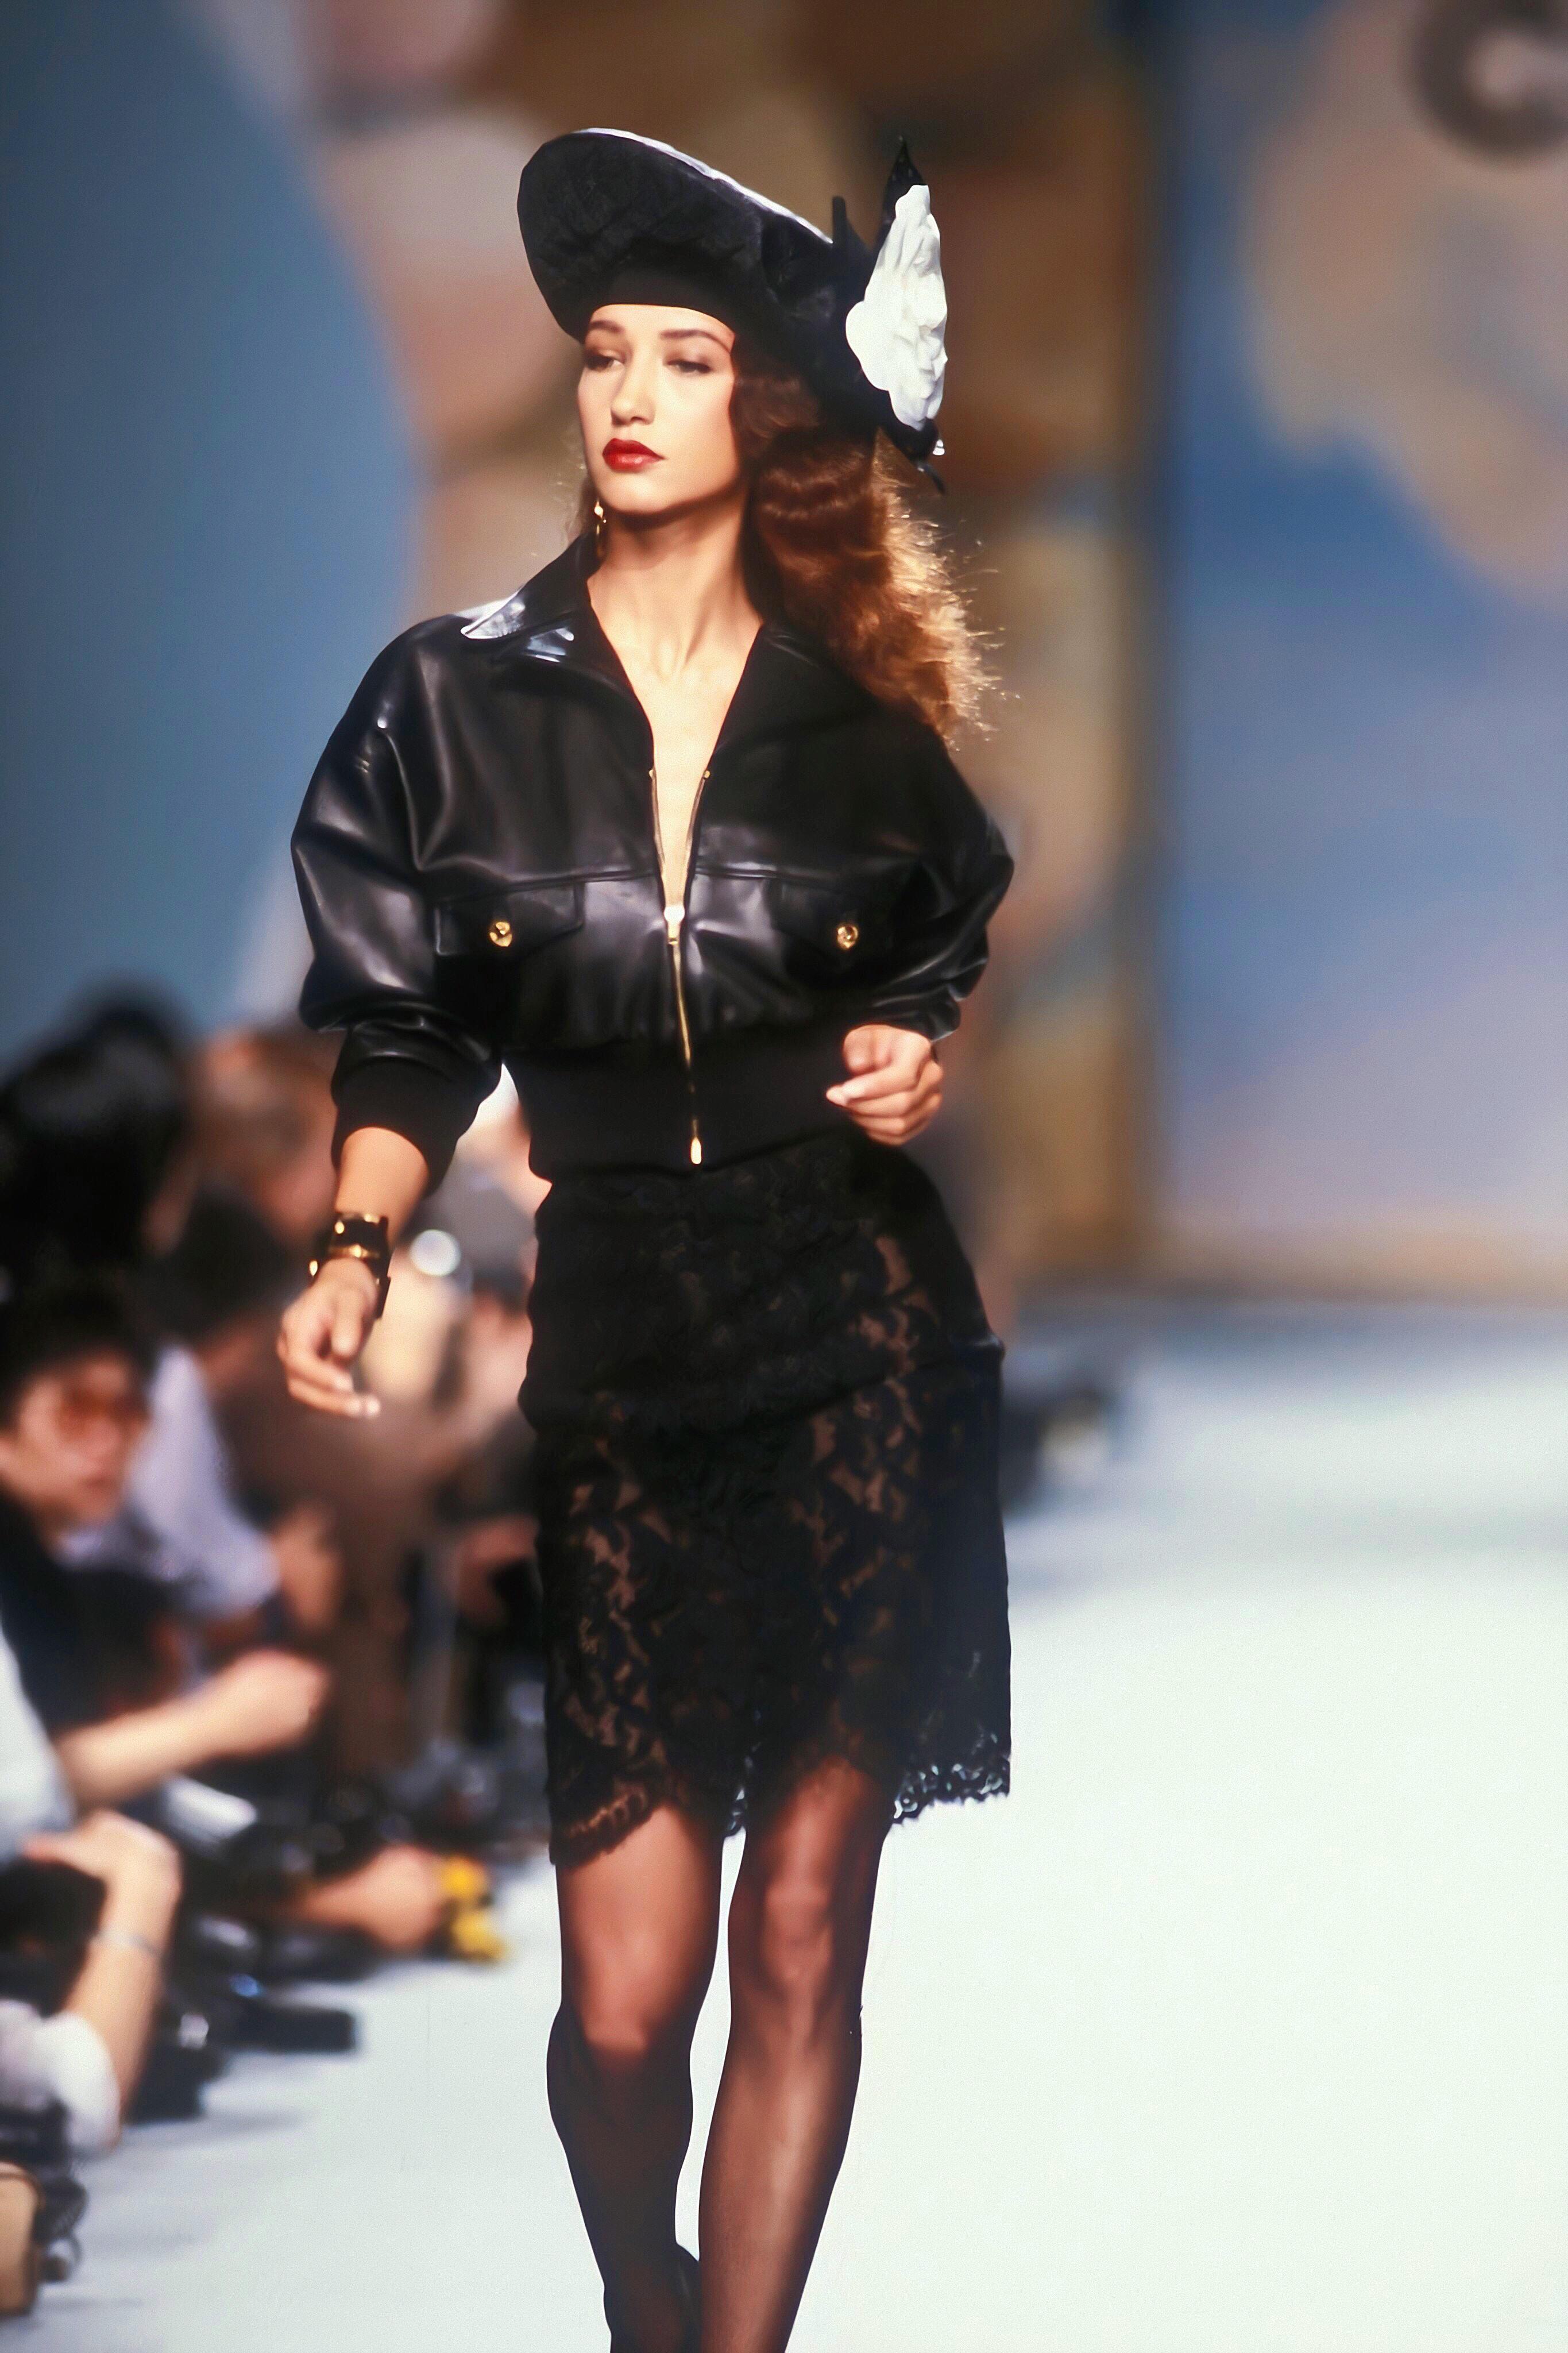 Chanel S/S 1988,是香奈儿1988年的一场秀,上世纪八十年代-前方高能